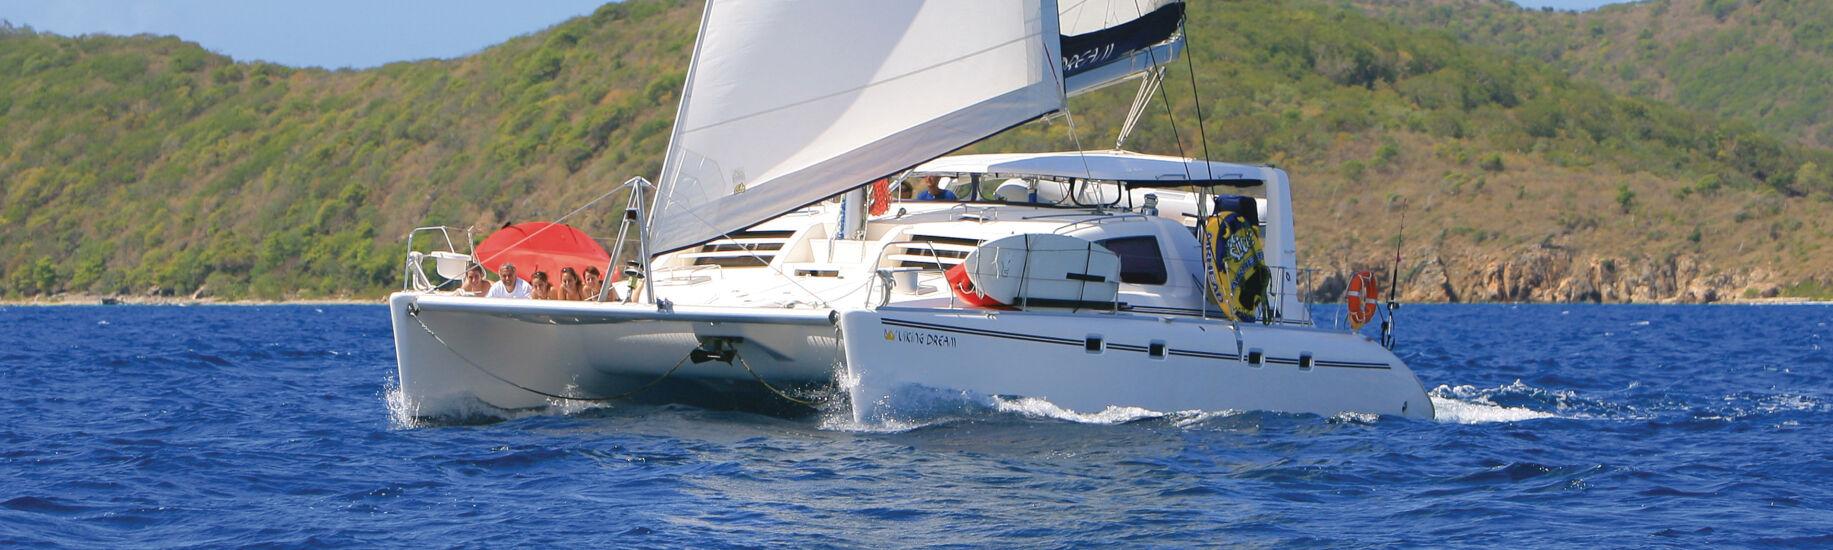 Luxury Yacht Travel